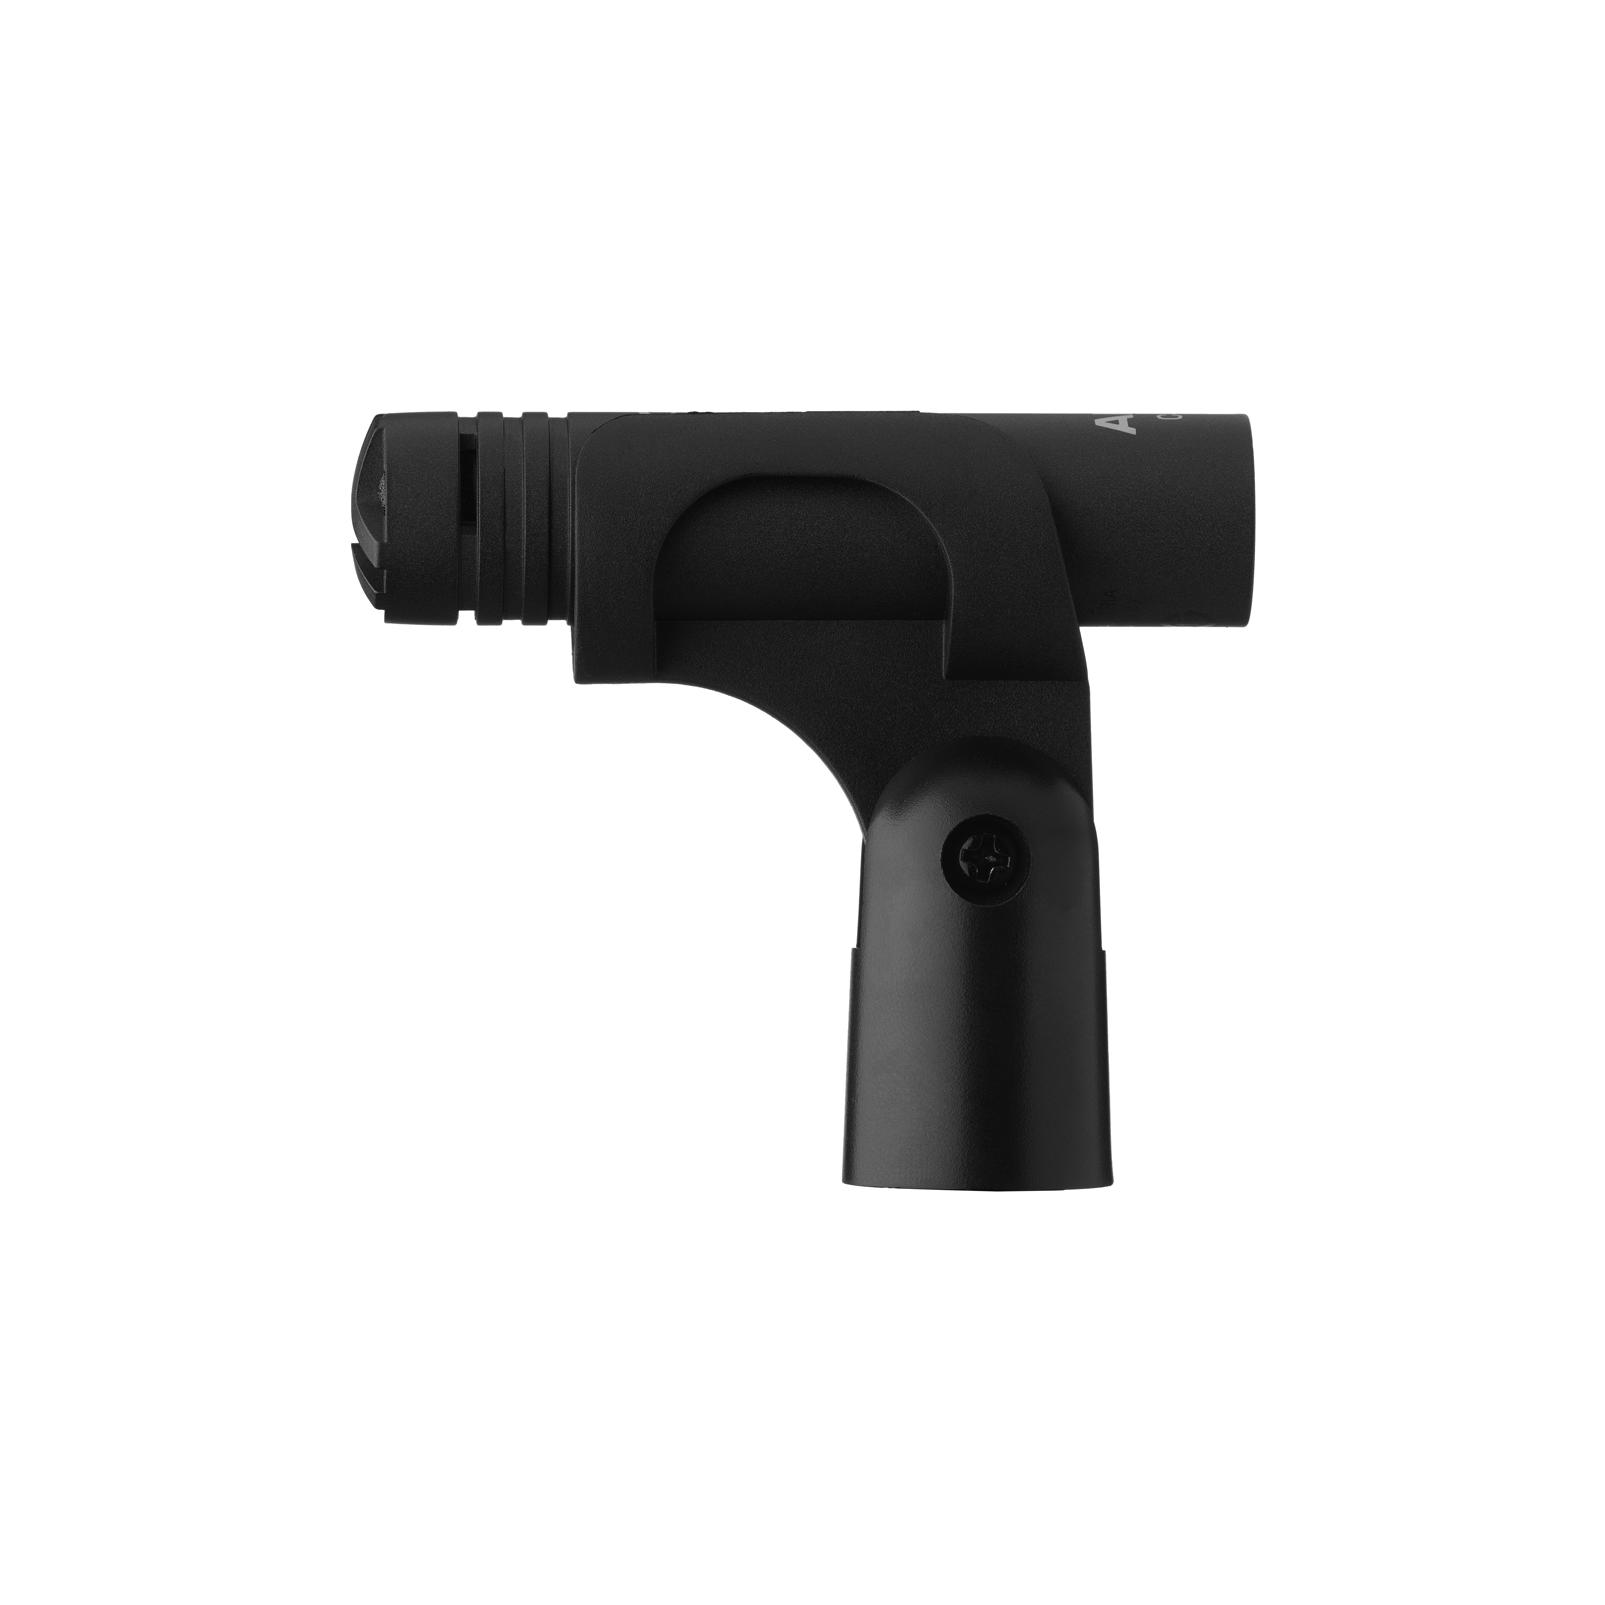 C430 - Black - Professional miniature condenser microphone - Left